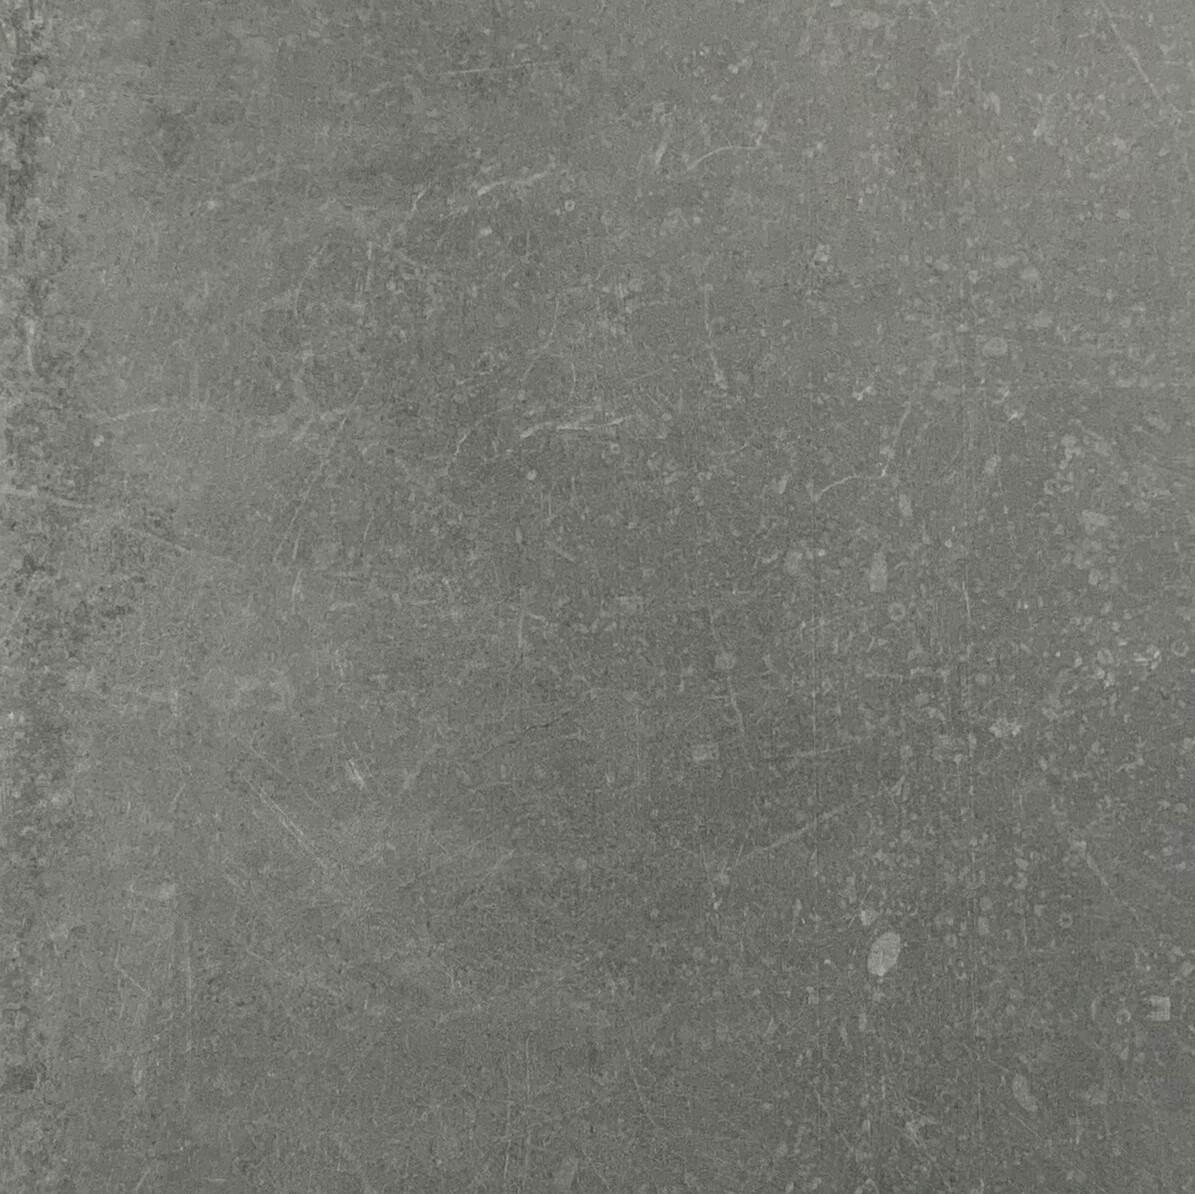 Icone Gris Matt Rectified Italian Porcelain Tile 3171